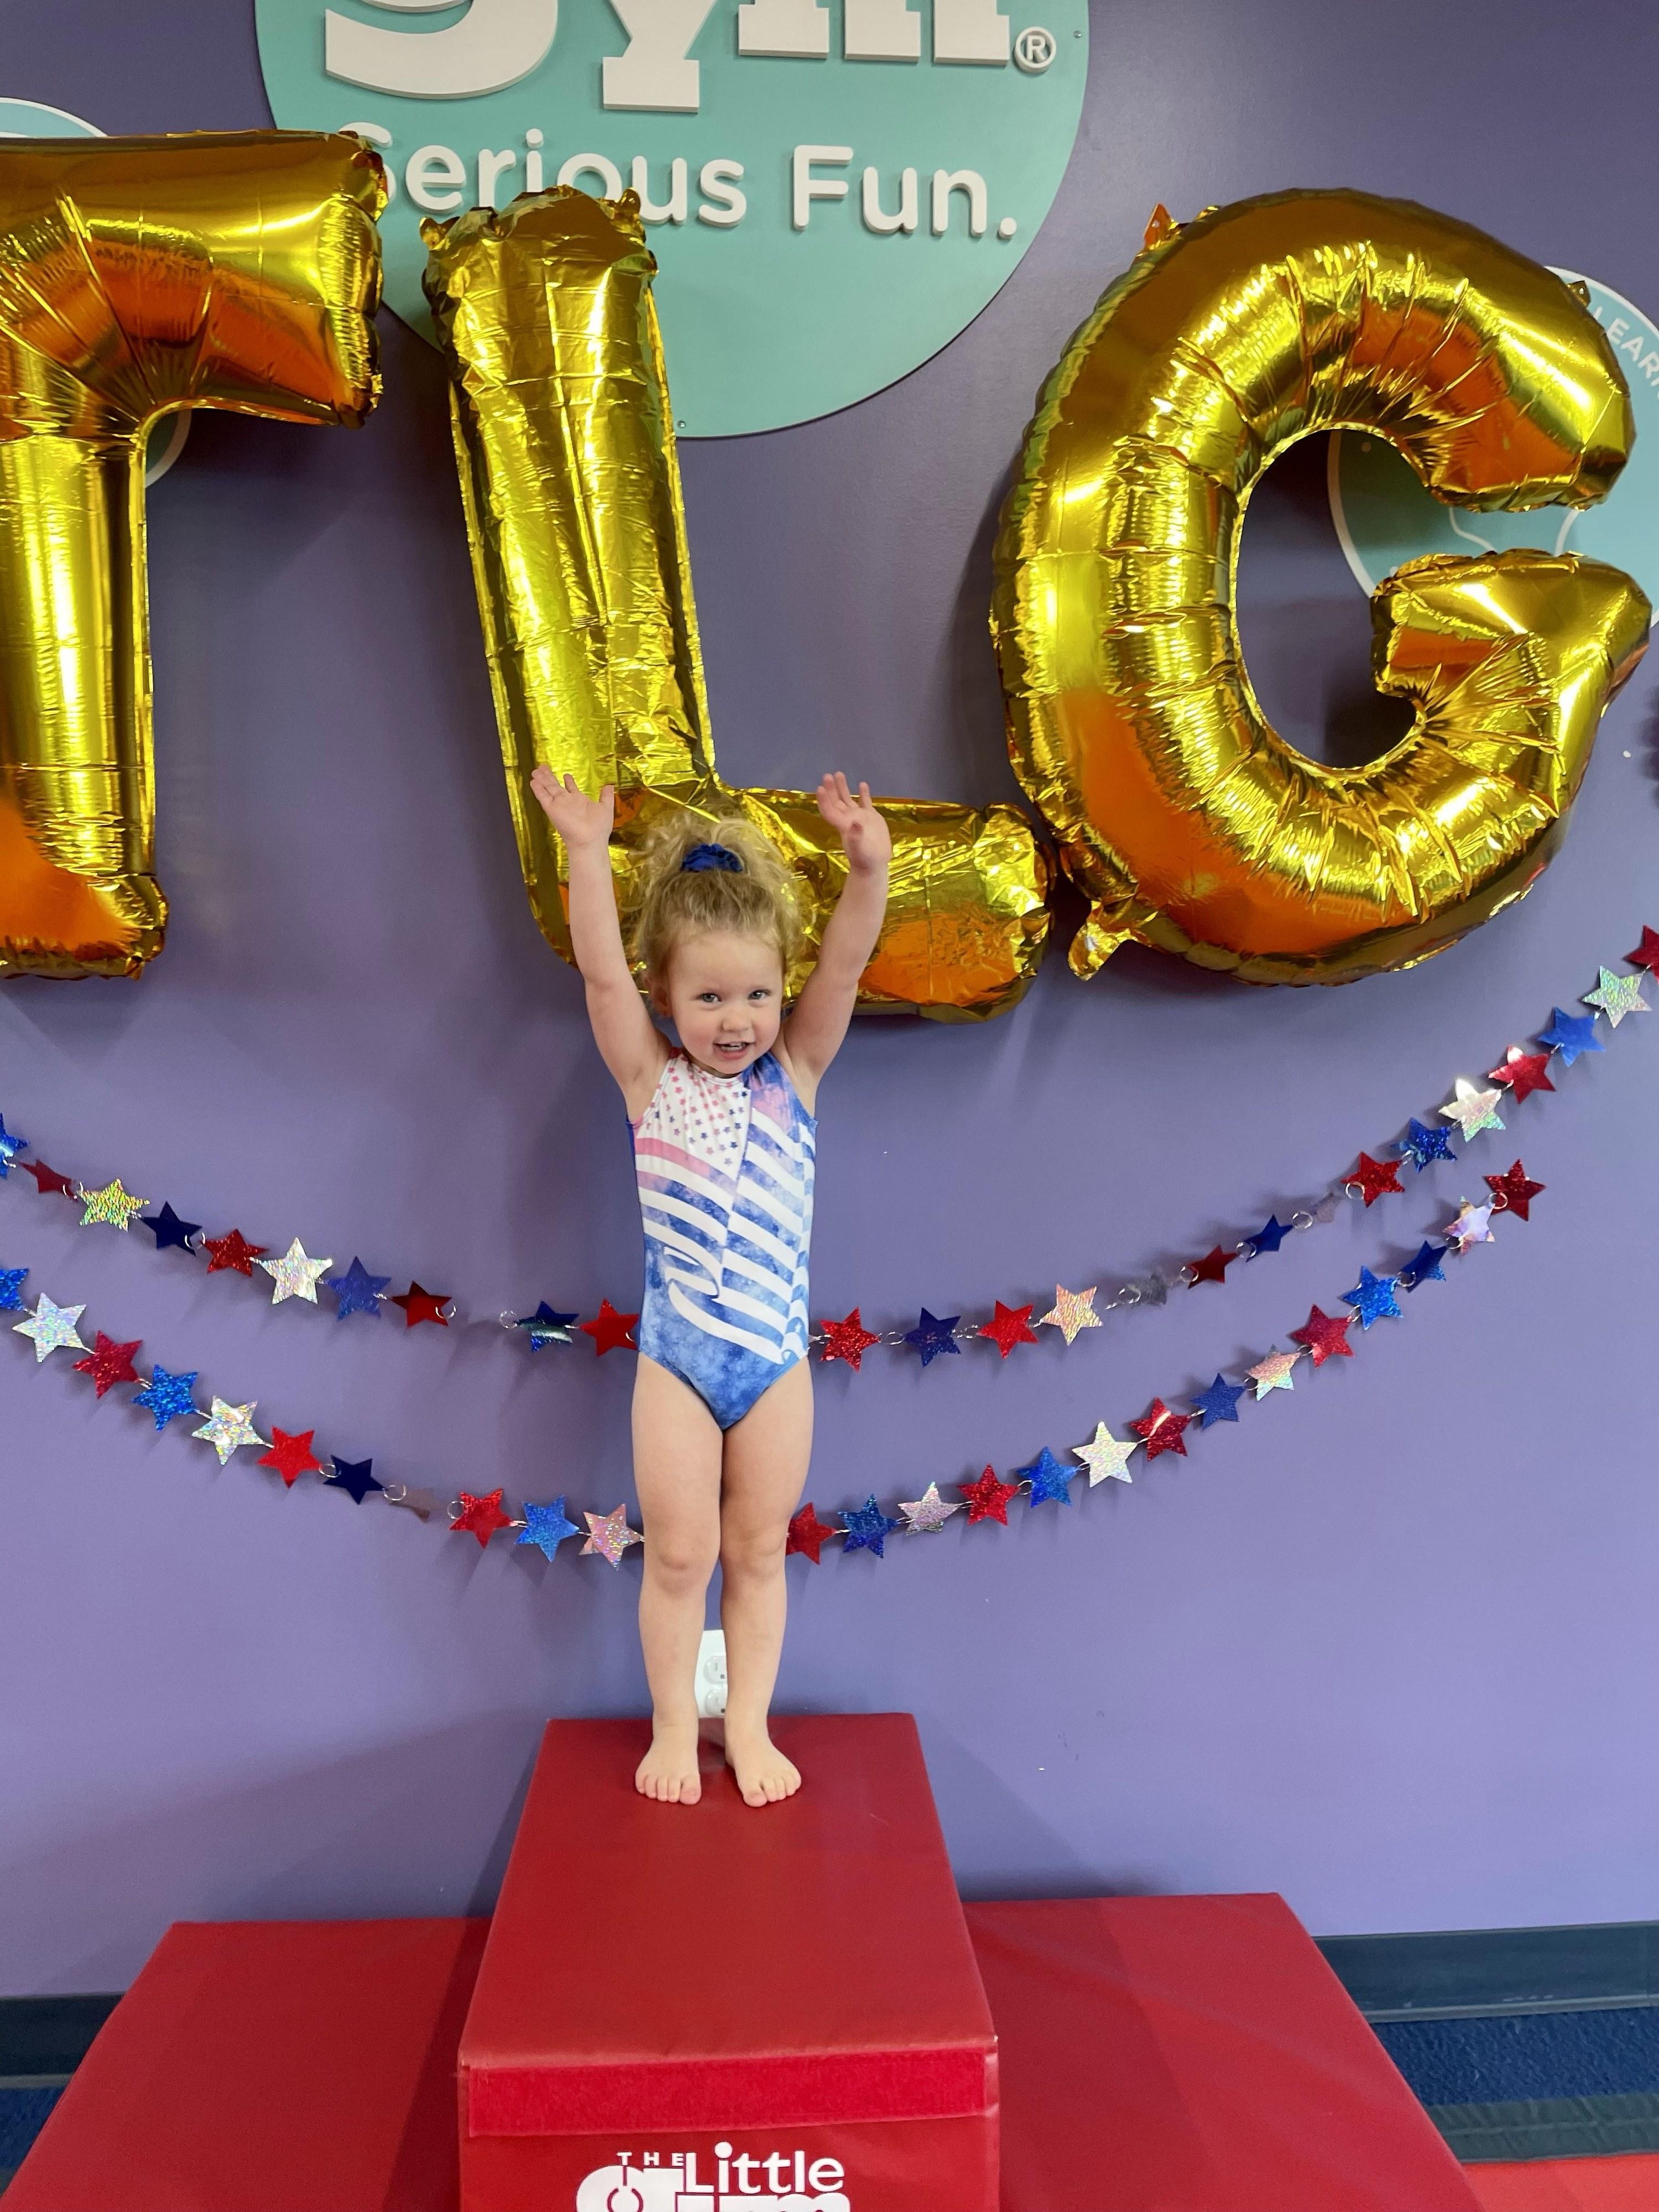 The author's daughter at gymnastics class